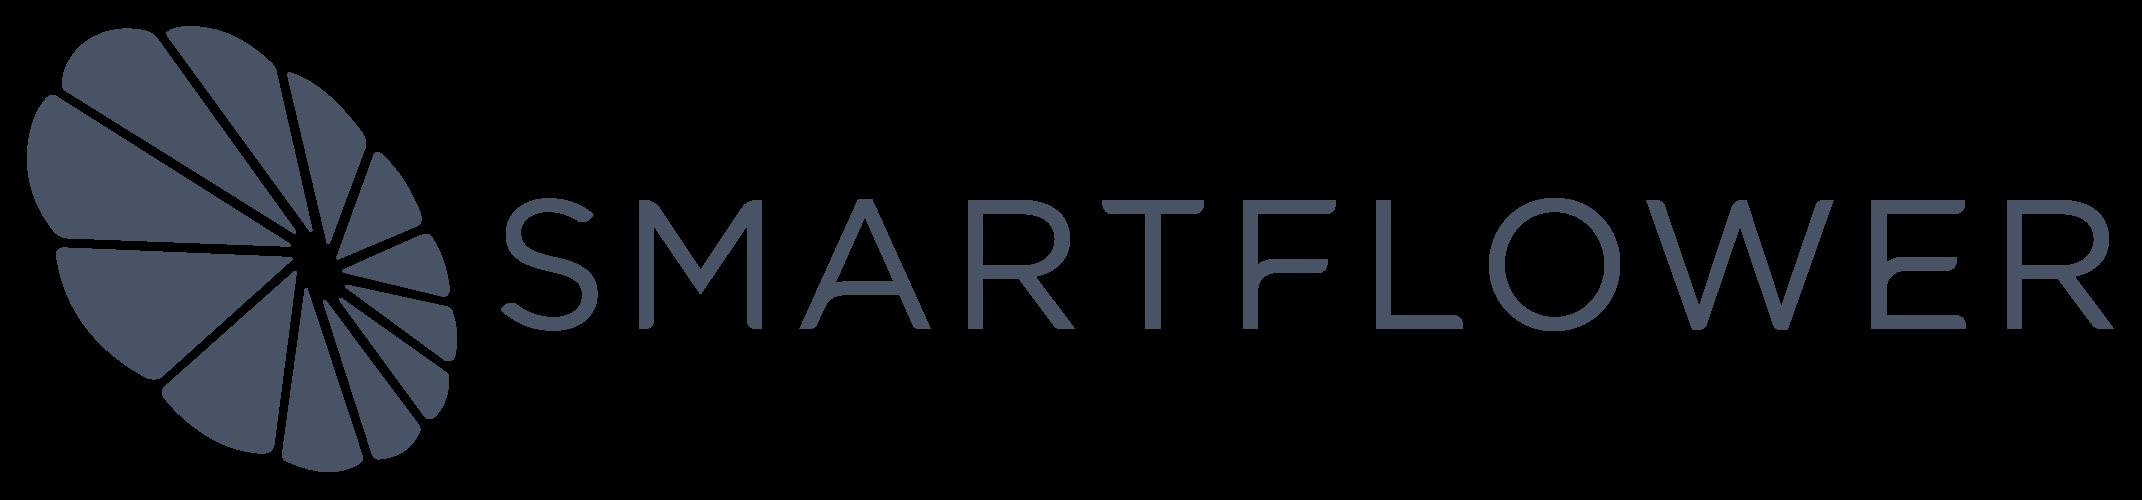 Smartflower_logo